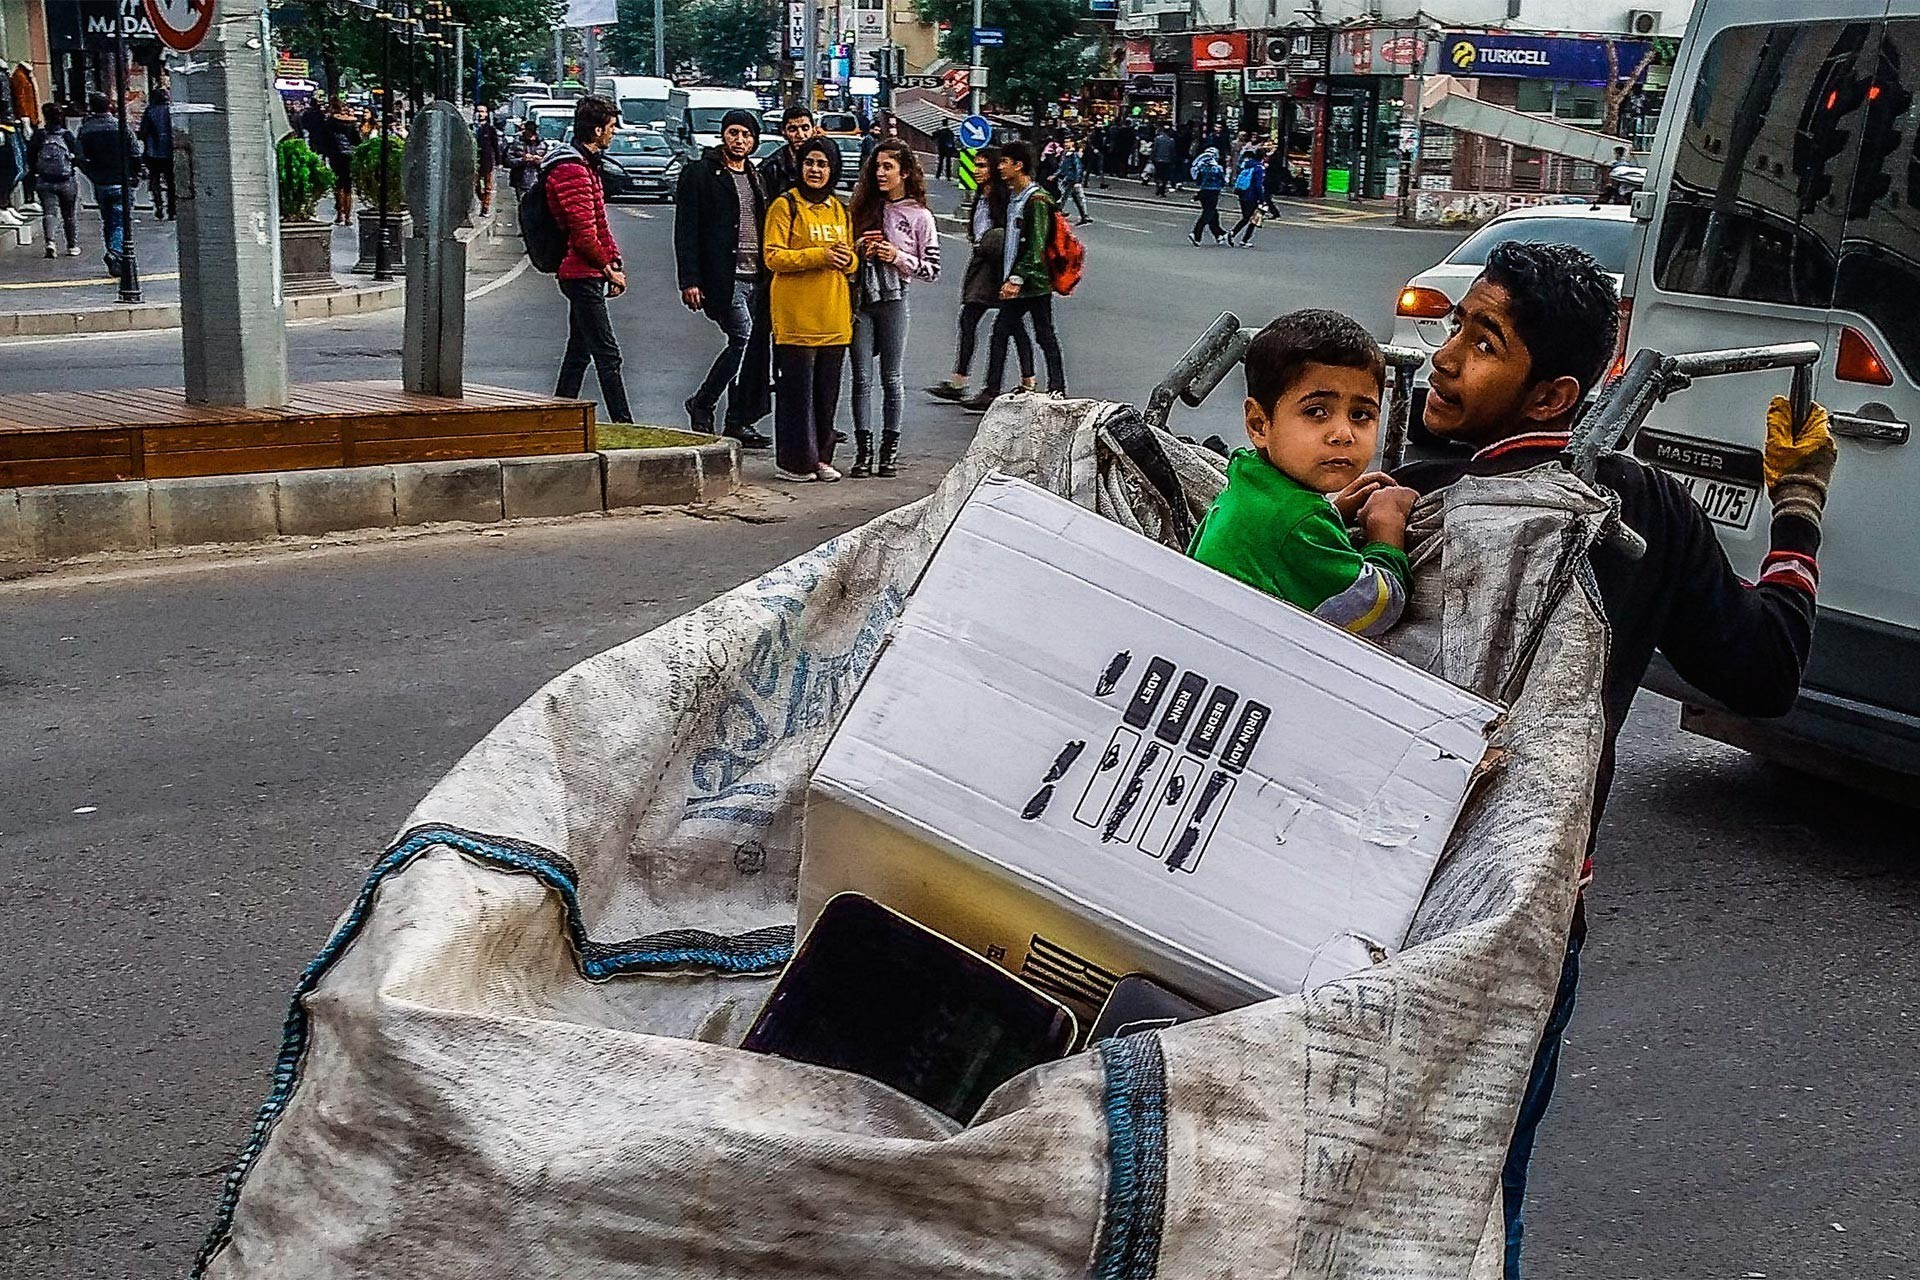 Kağıt toplayan mülteci işçi